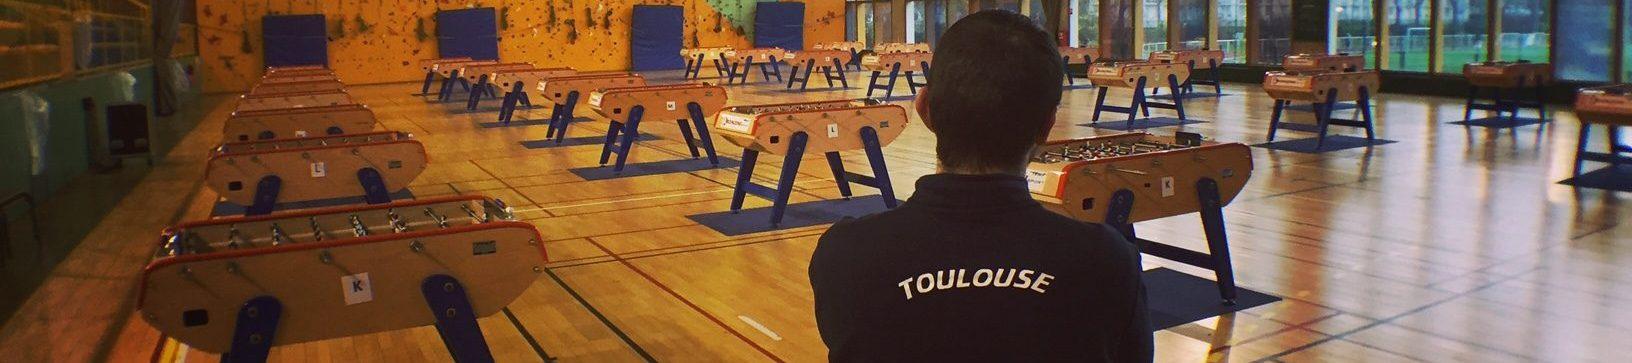 Toulouse Football de Table